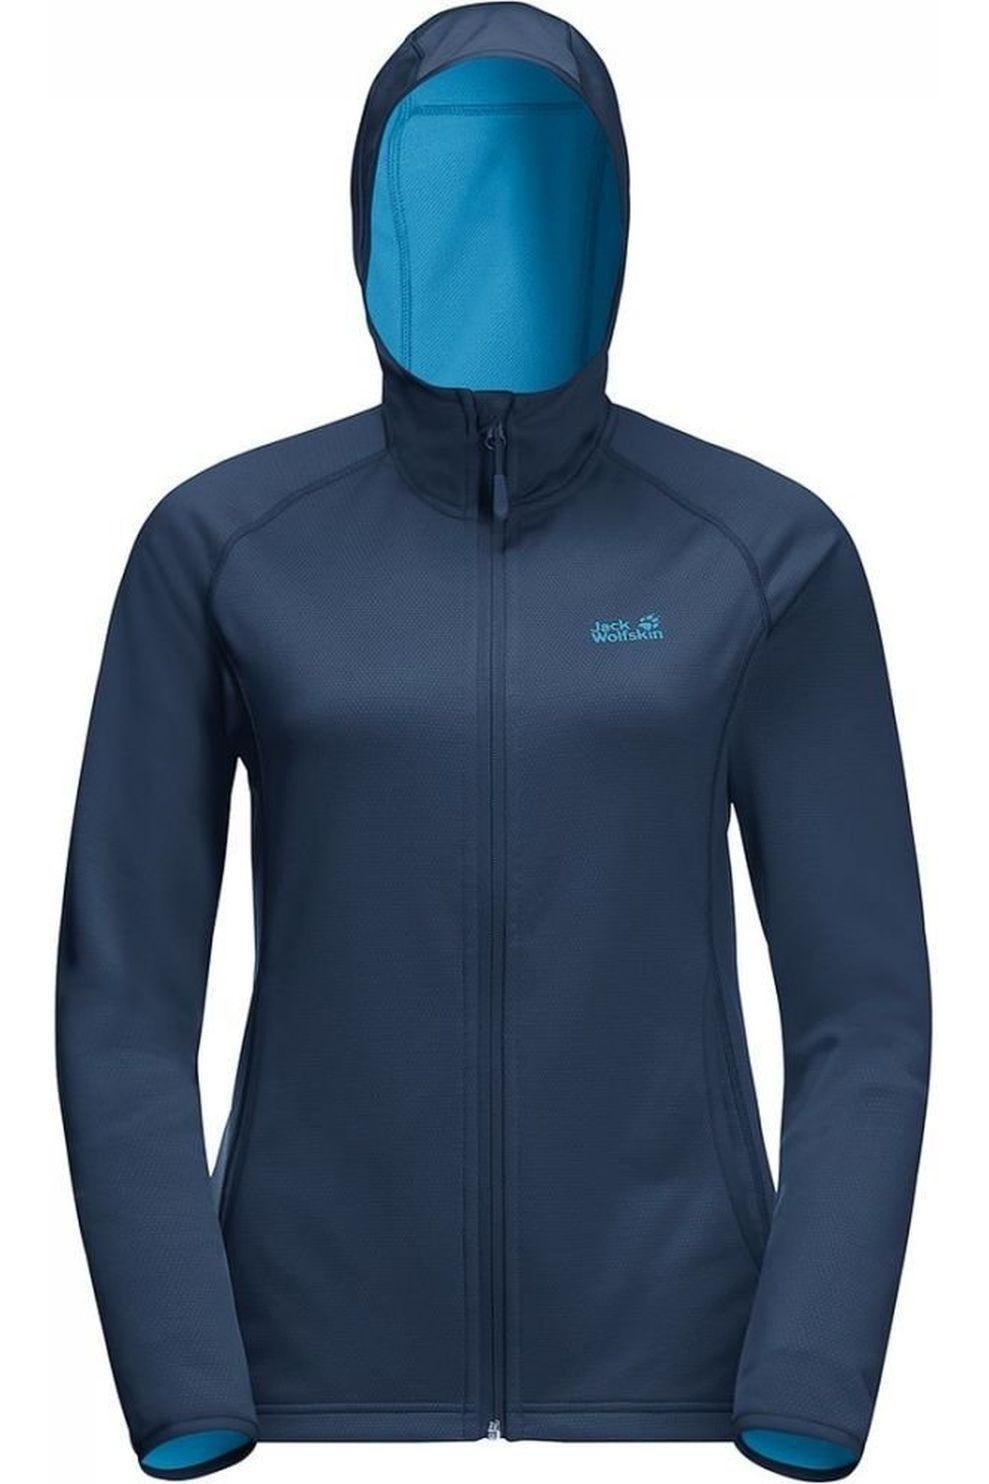 Jack Wolfskin Fleece Star voor dames Blauw Maten: S, M, L, XL